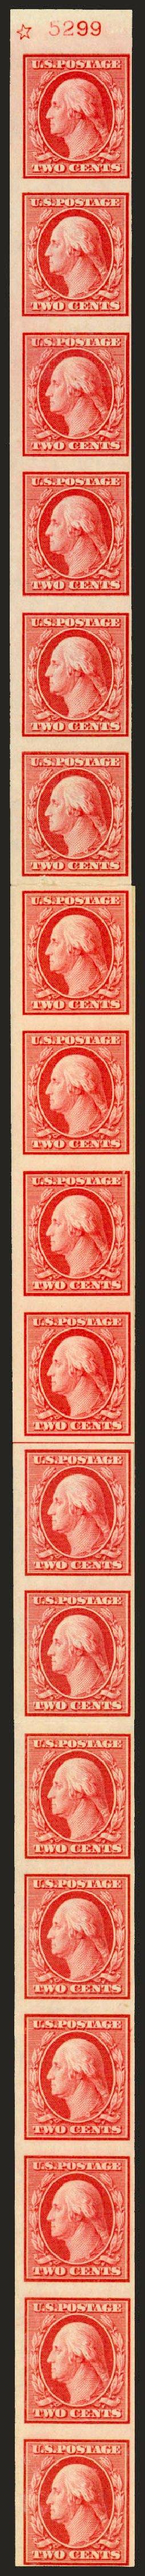 Cost of US Stamp Scott Cat. #344: 1909 2c Washington Imperf. Robert Siegel Auction Galleries, Jun 2010, Sale 992, Lot 2433